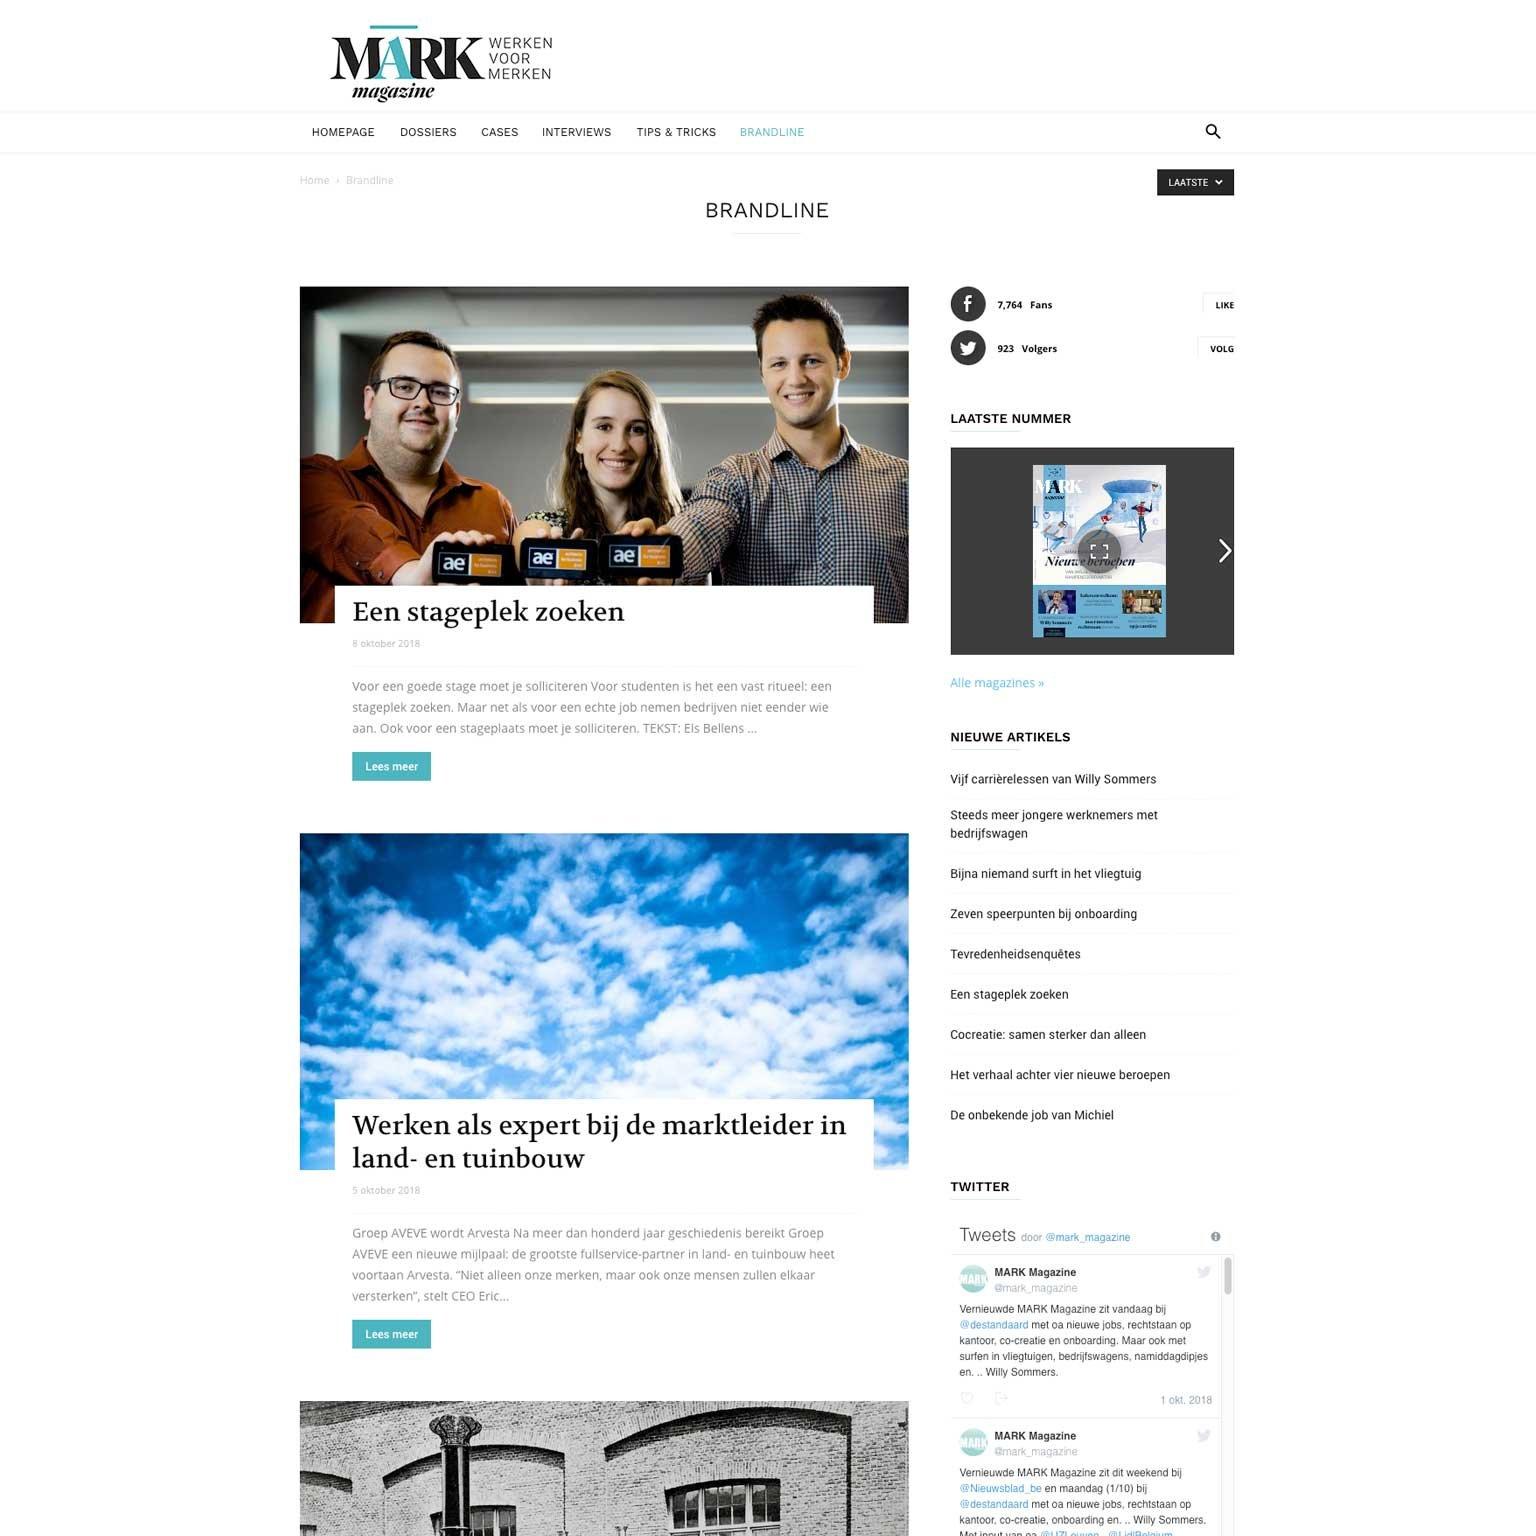 leadstreet-case-study-markmagazine-1